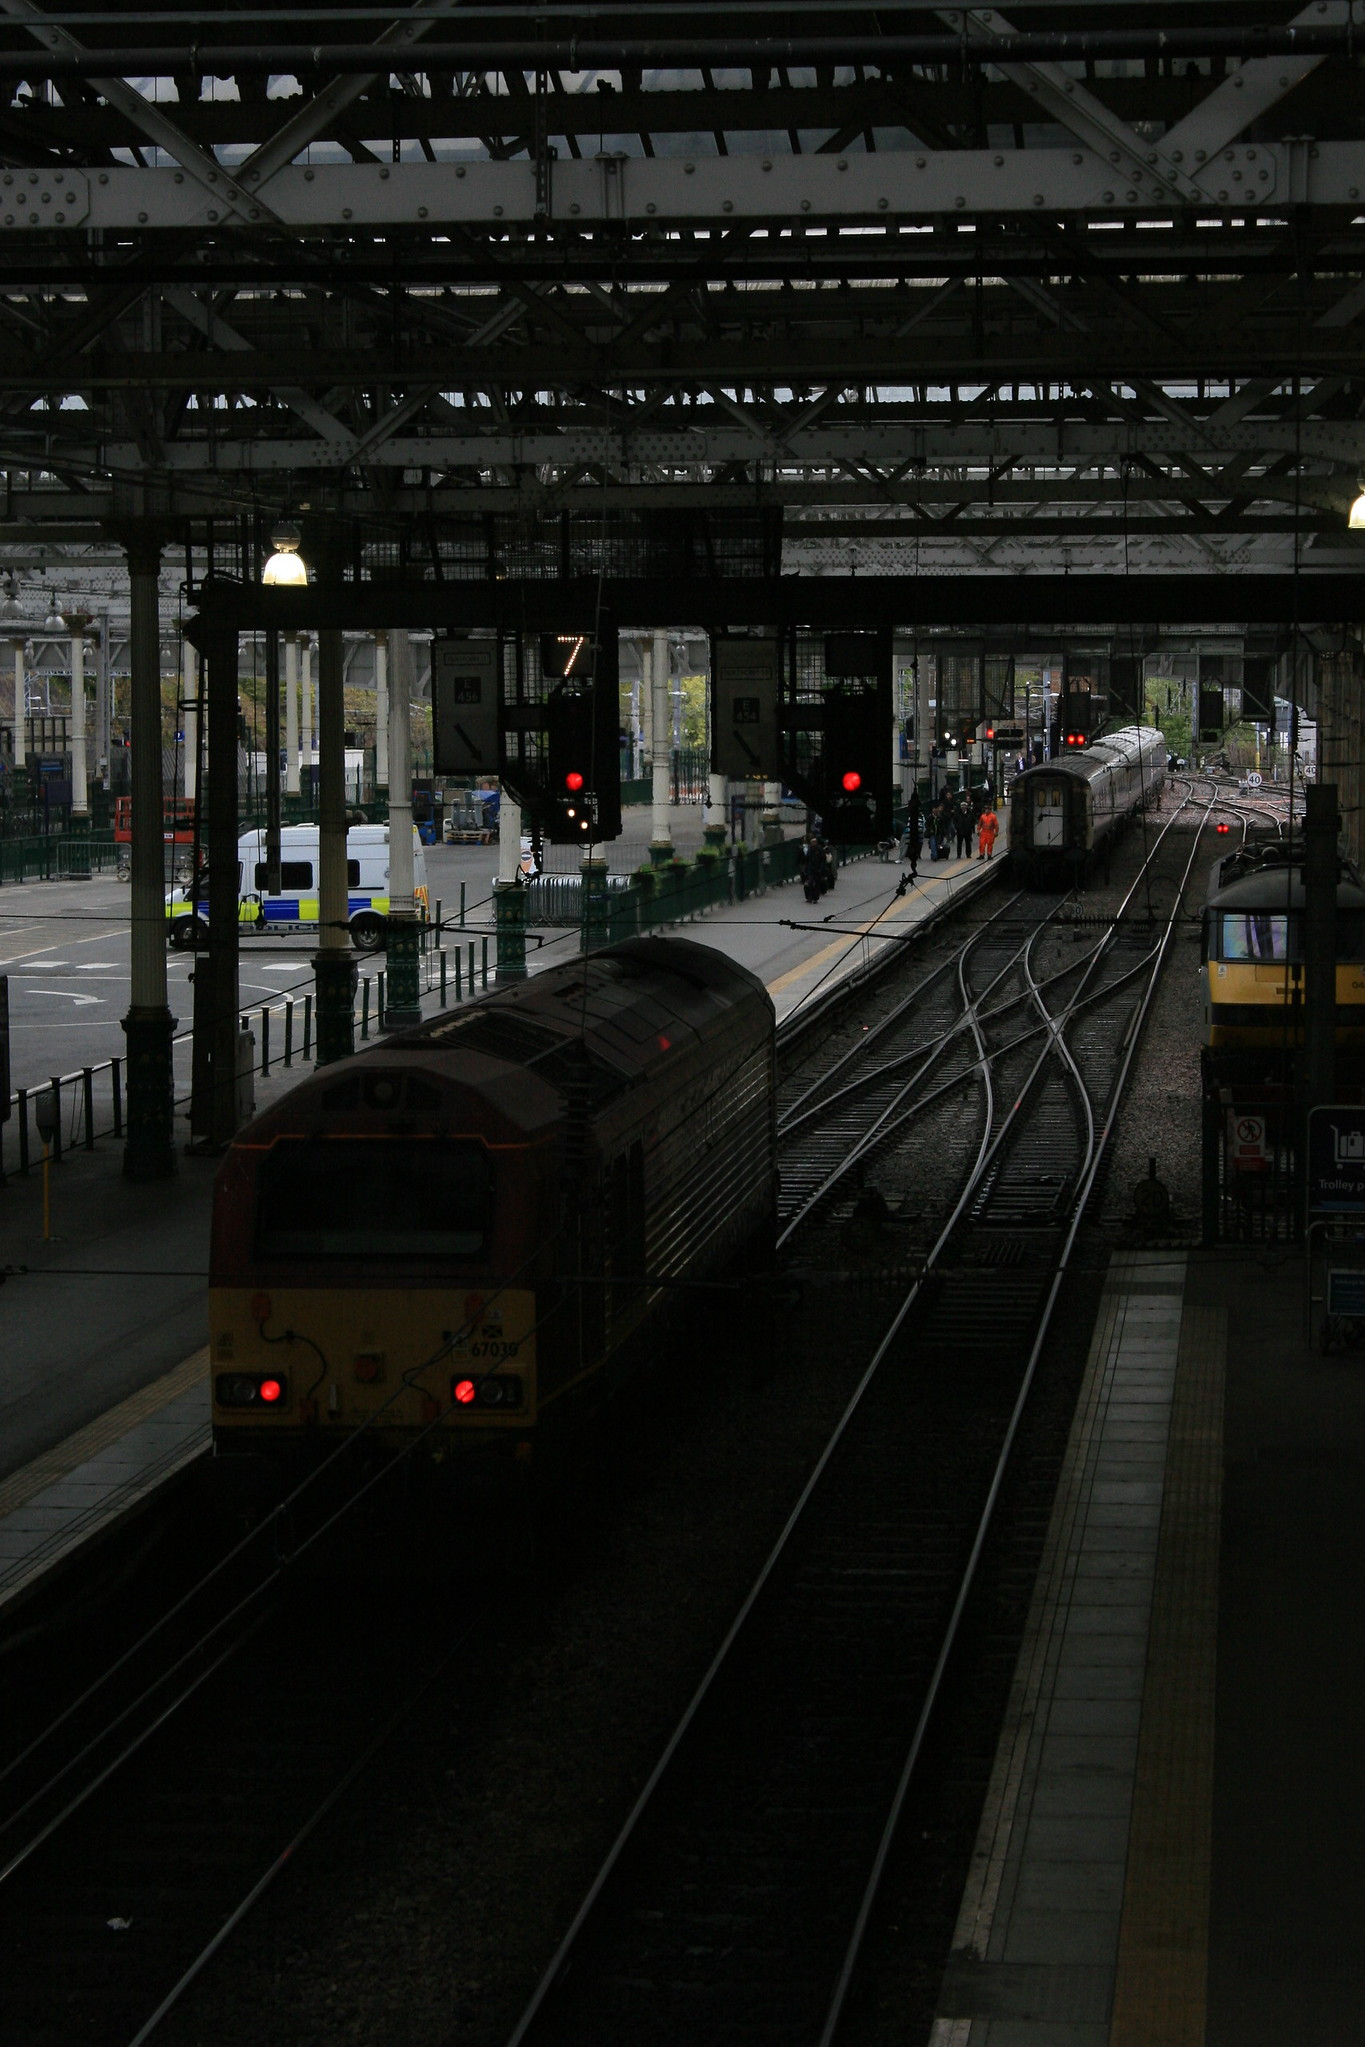 67030_DBS_CaledonianSleeper_EdinburghWaverley_18052016 (5)